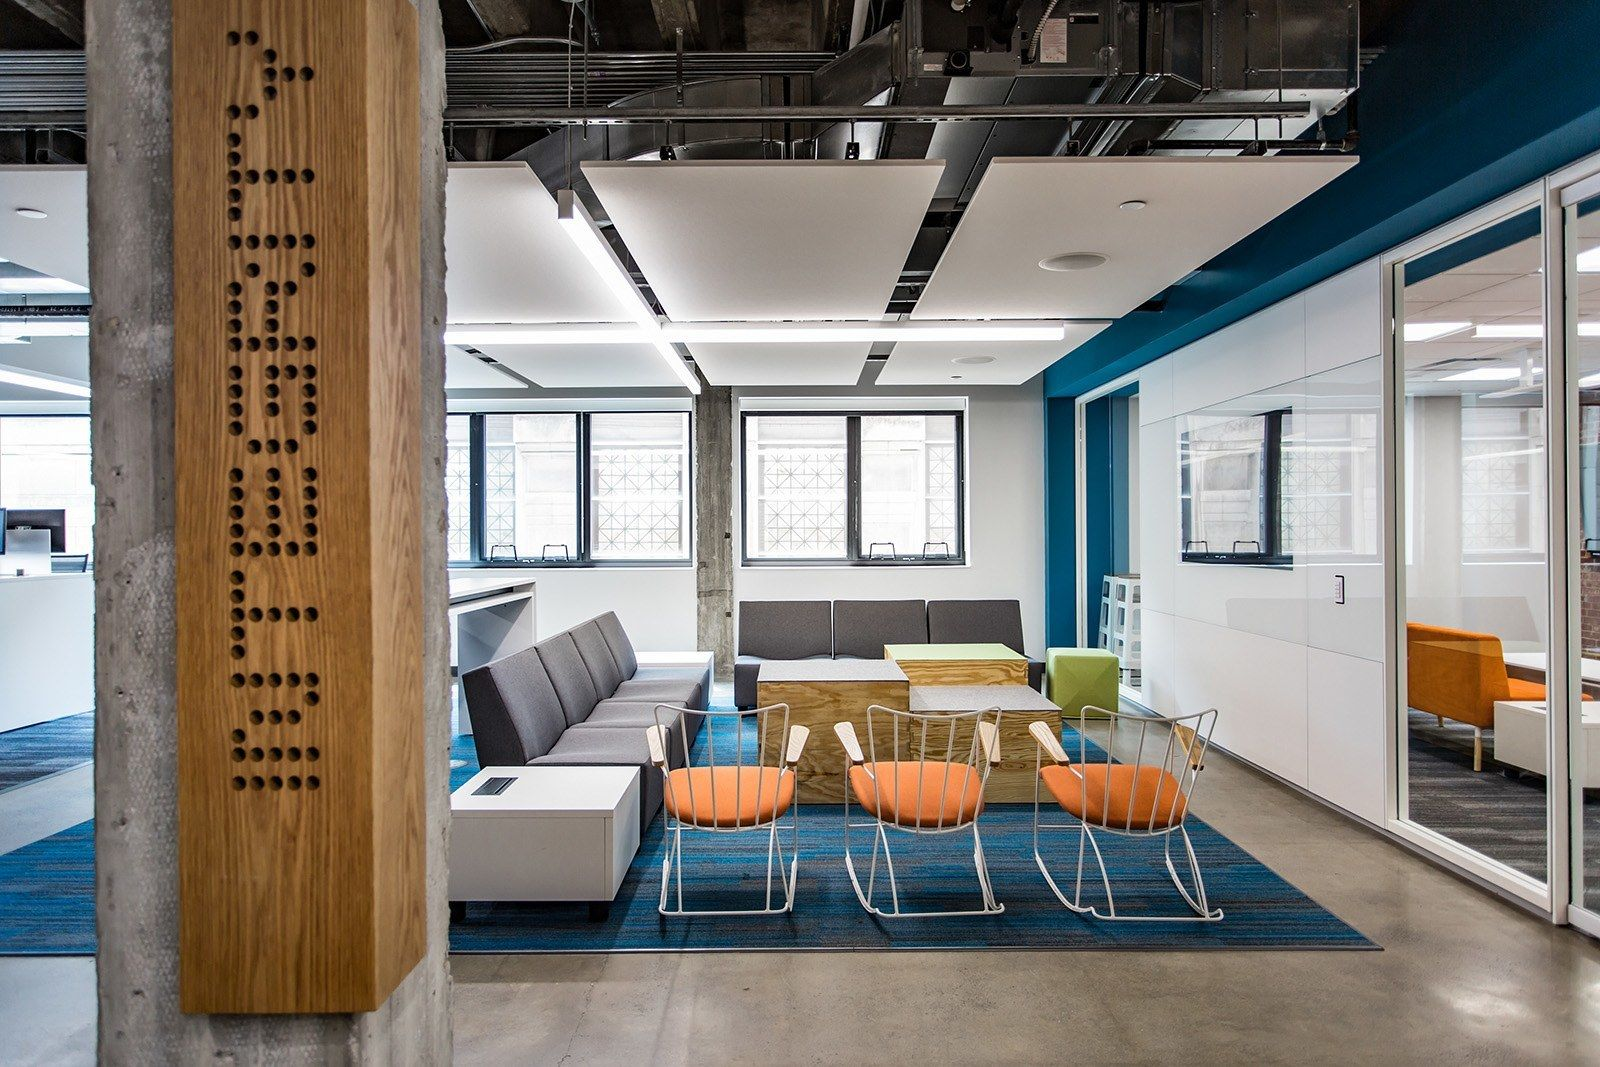 Inside motorists insurance groups innovation center